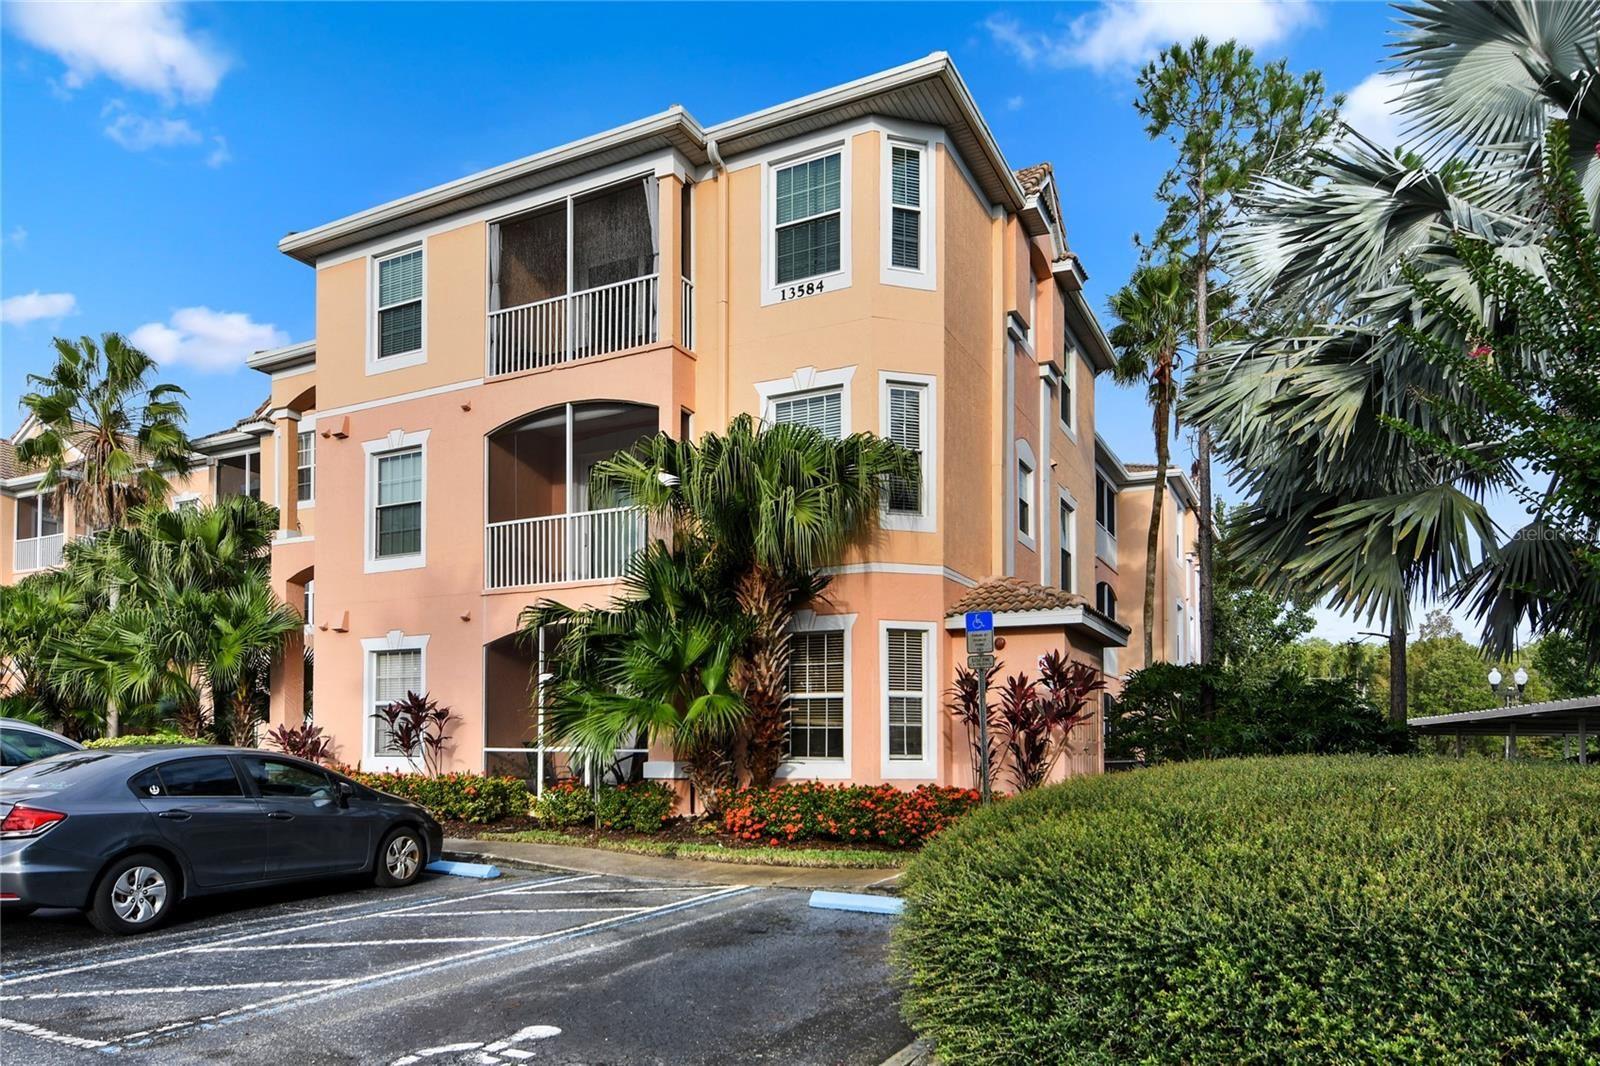 13584 TURTLE MARSH LOOP #128, Orlando, FL 32837 - #: S5056258